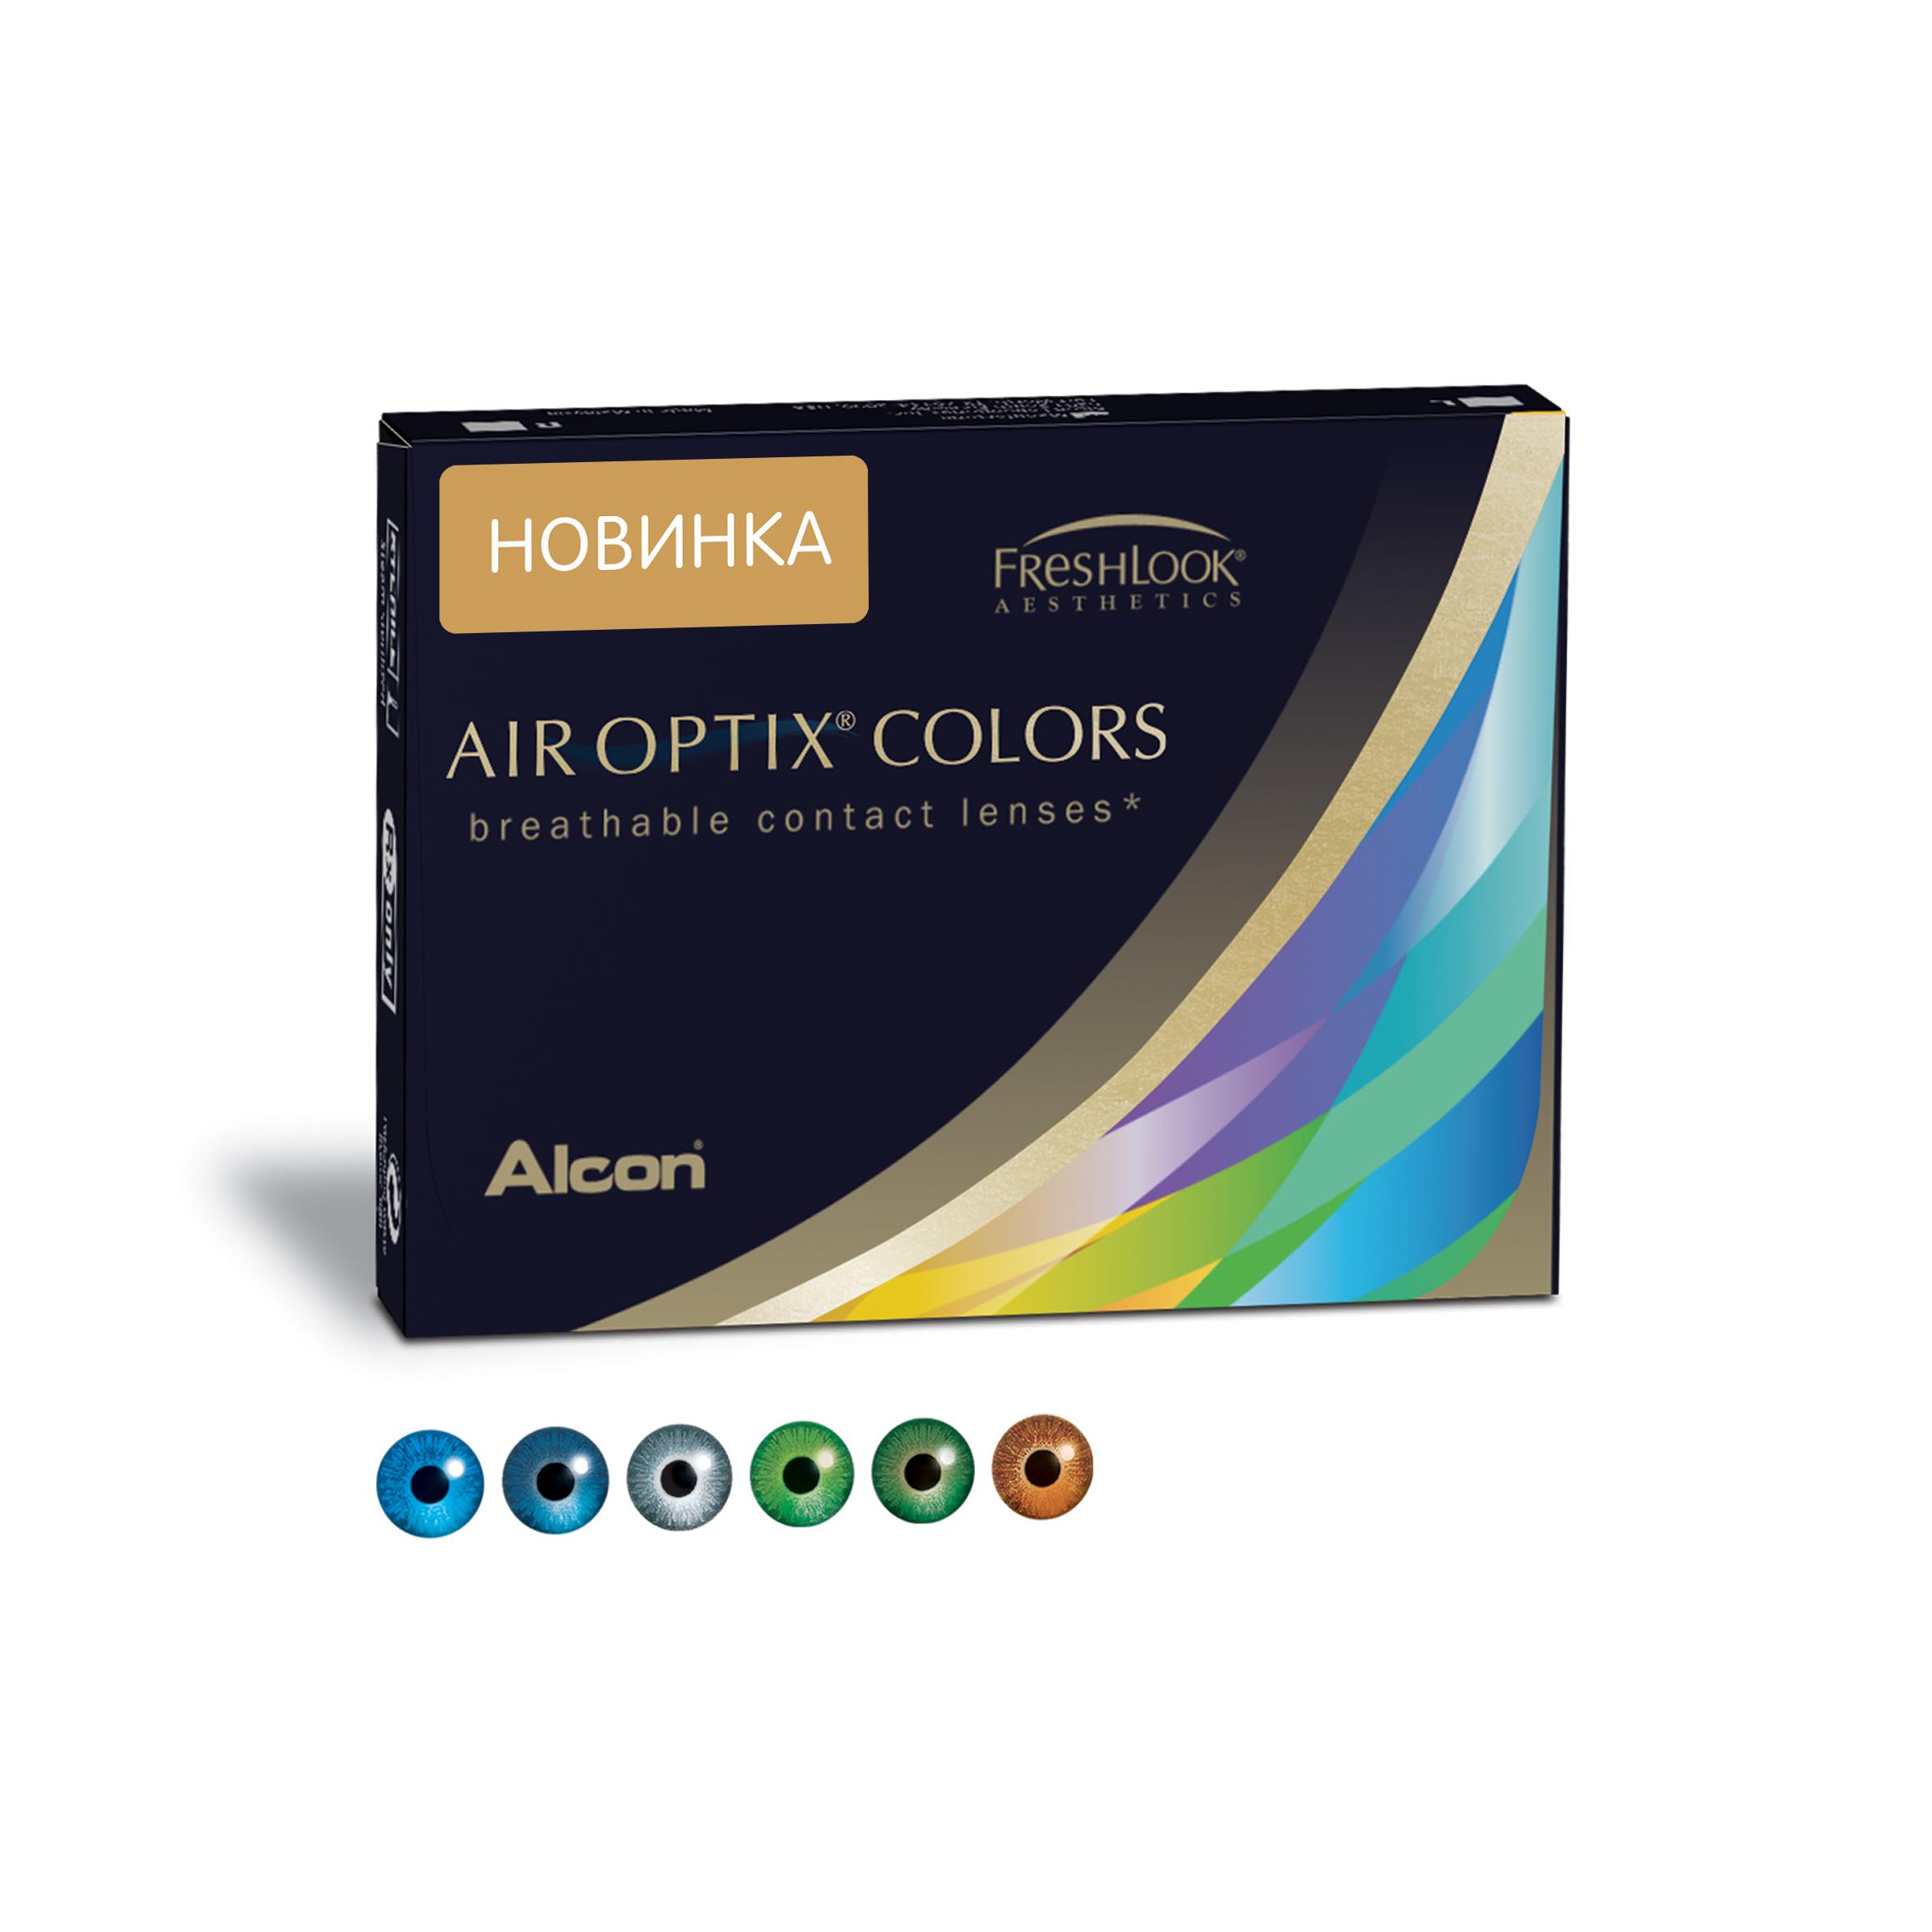 Аlcon контактные линзы Air Optix Colors 2 шт 0.00 Green31746090Мягкие контактные линзы